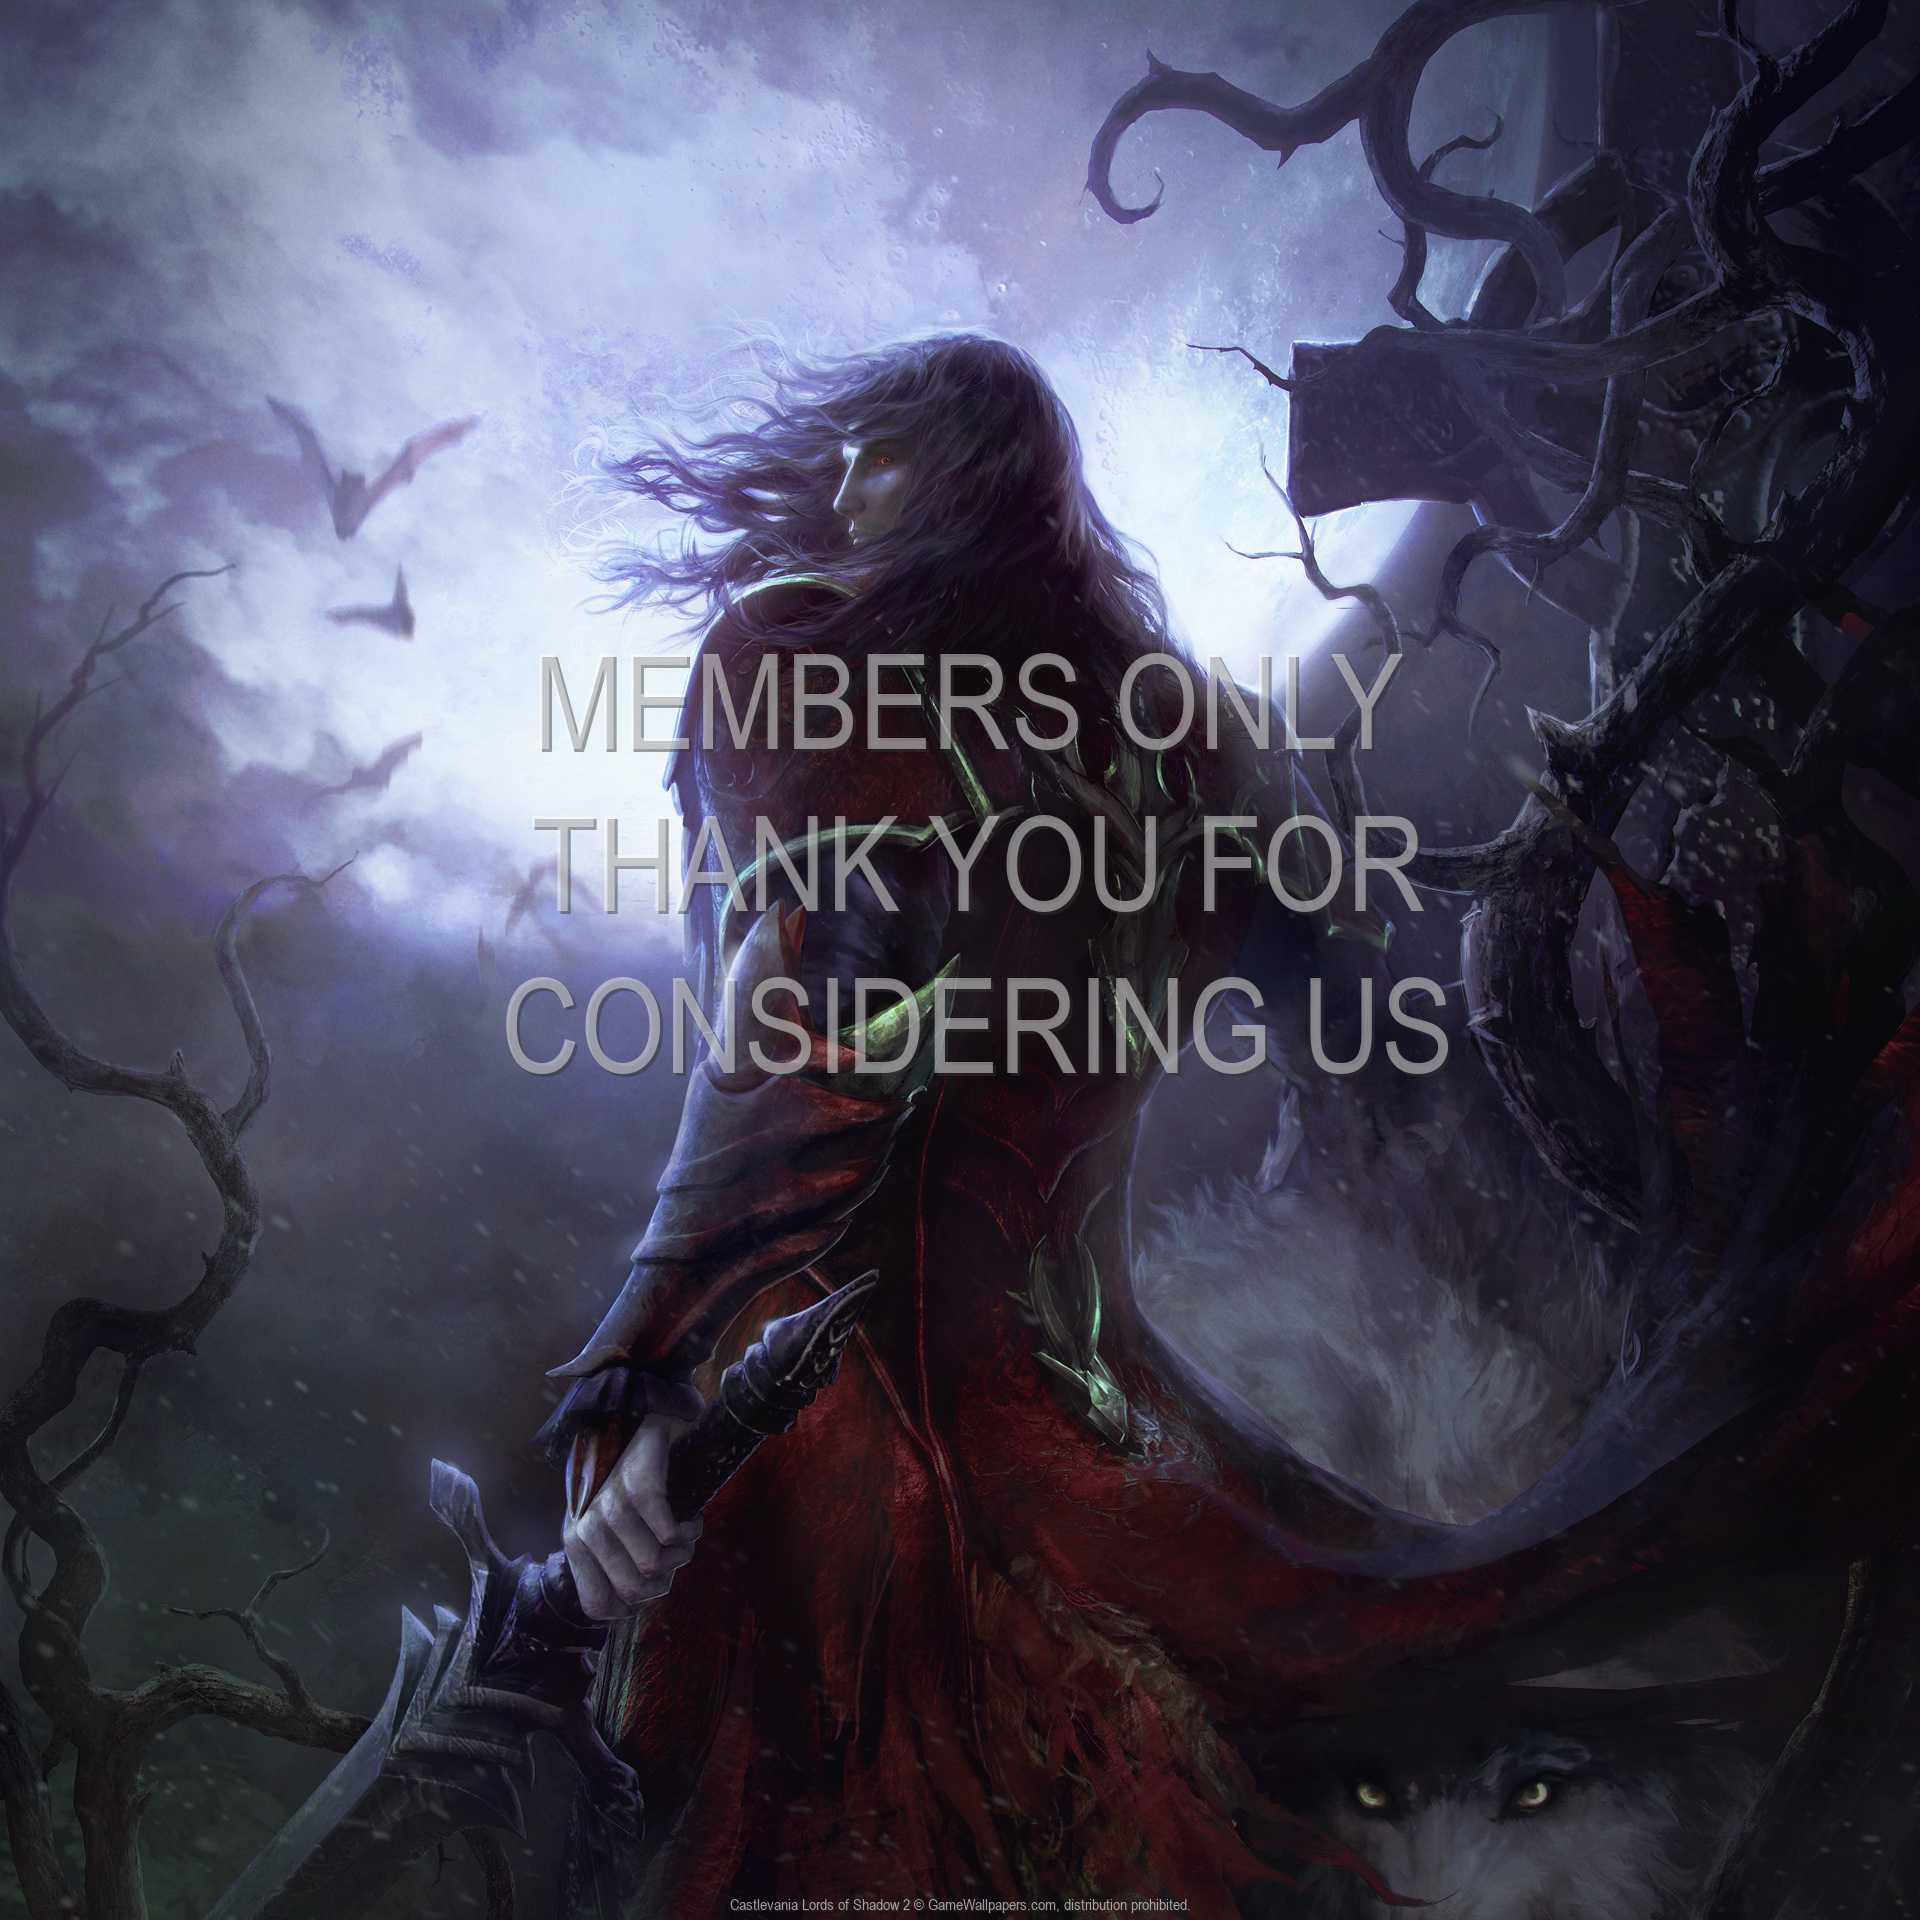 Castlevania: Lords of Shadow 2 1080p Horizontal Handy Hintergrundbild 01